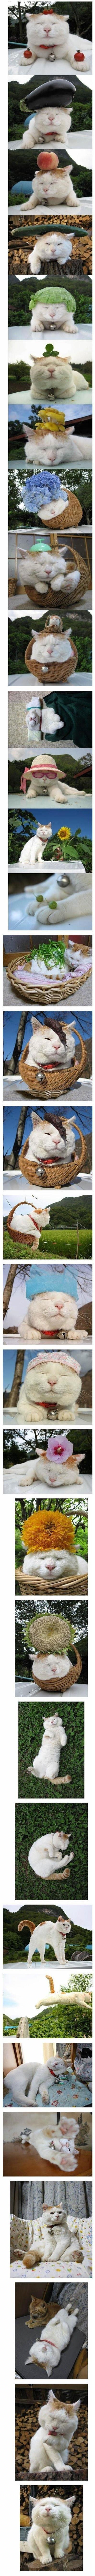 Ze cat. .. I see you've met my brother. cat